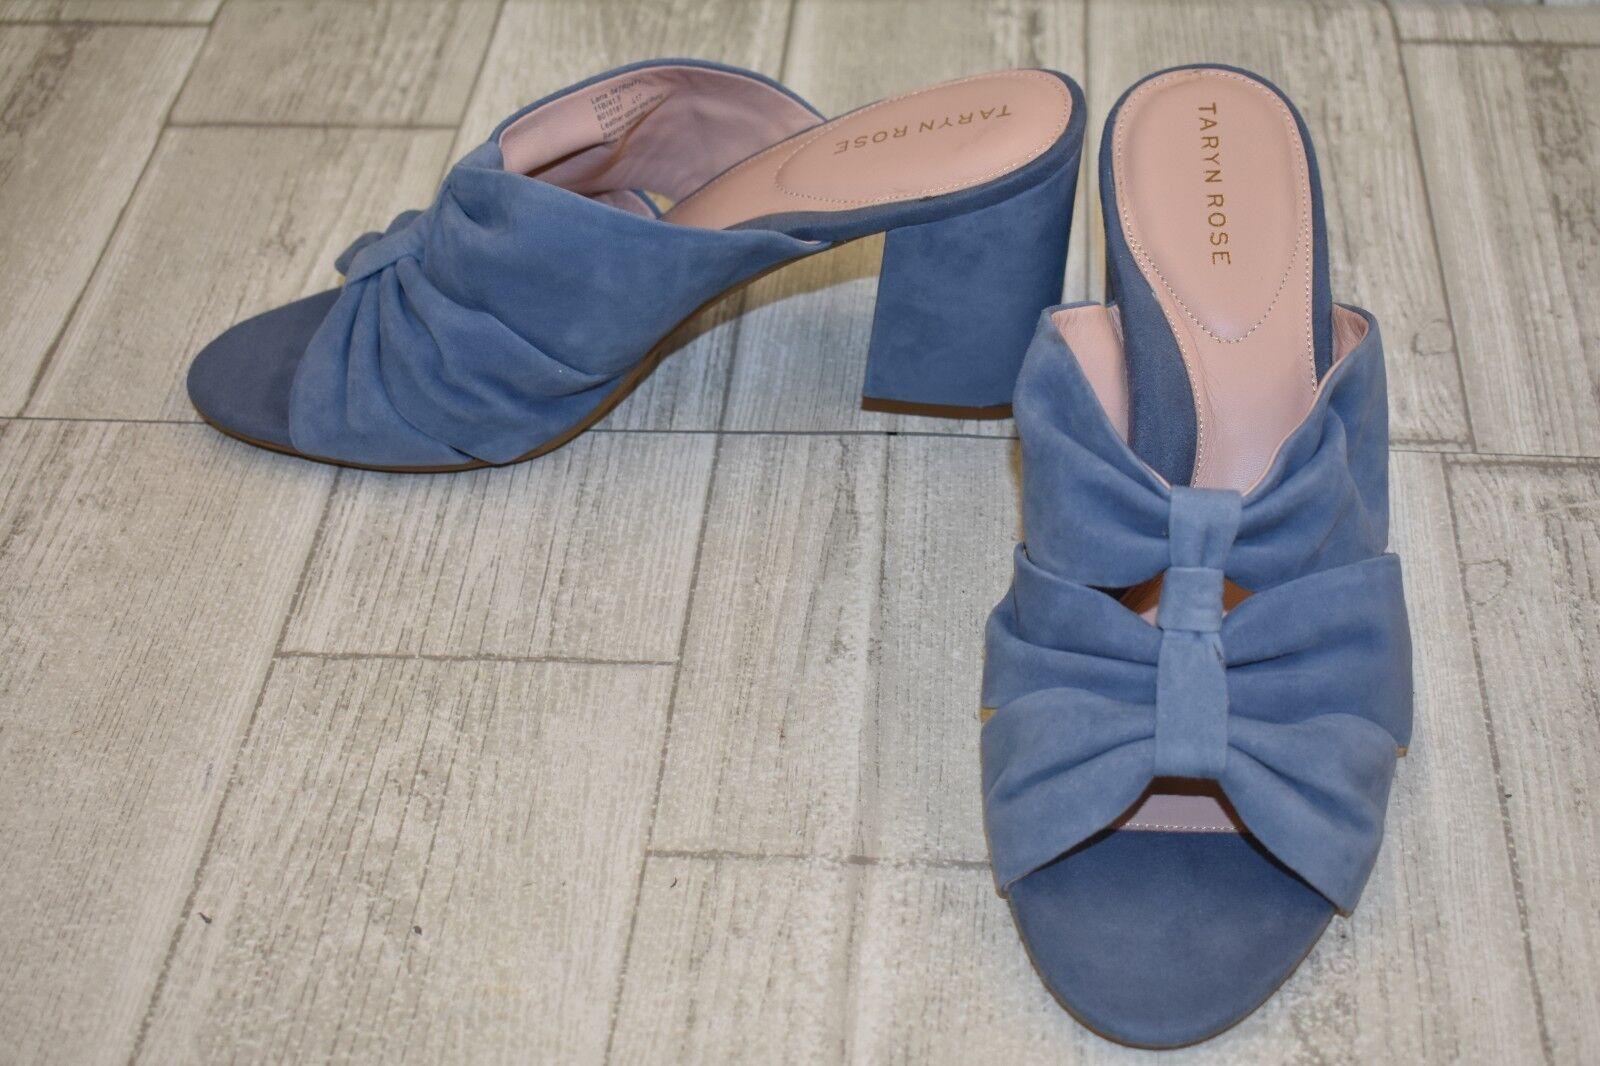 Taryn pink Lana Sandals-Women's size 11 B Denim